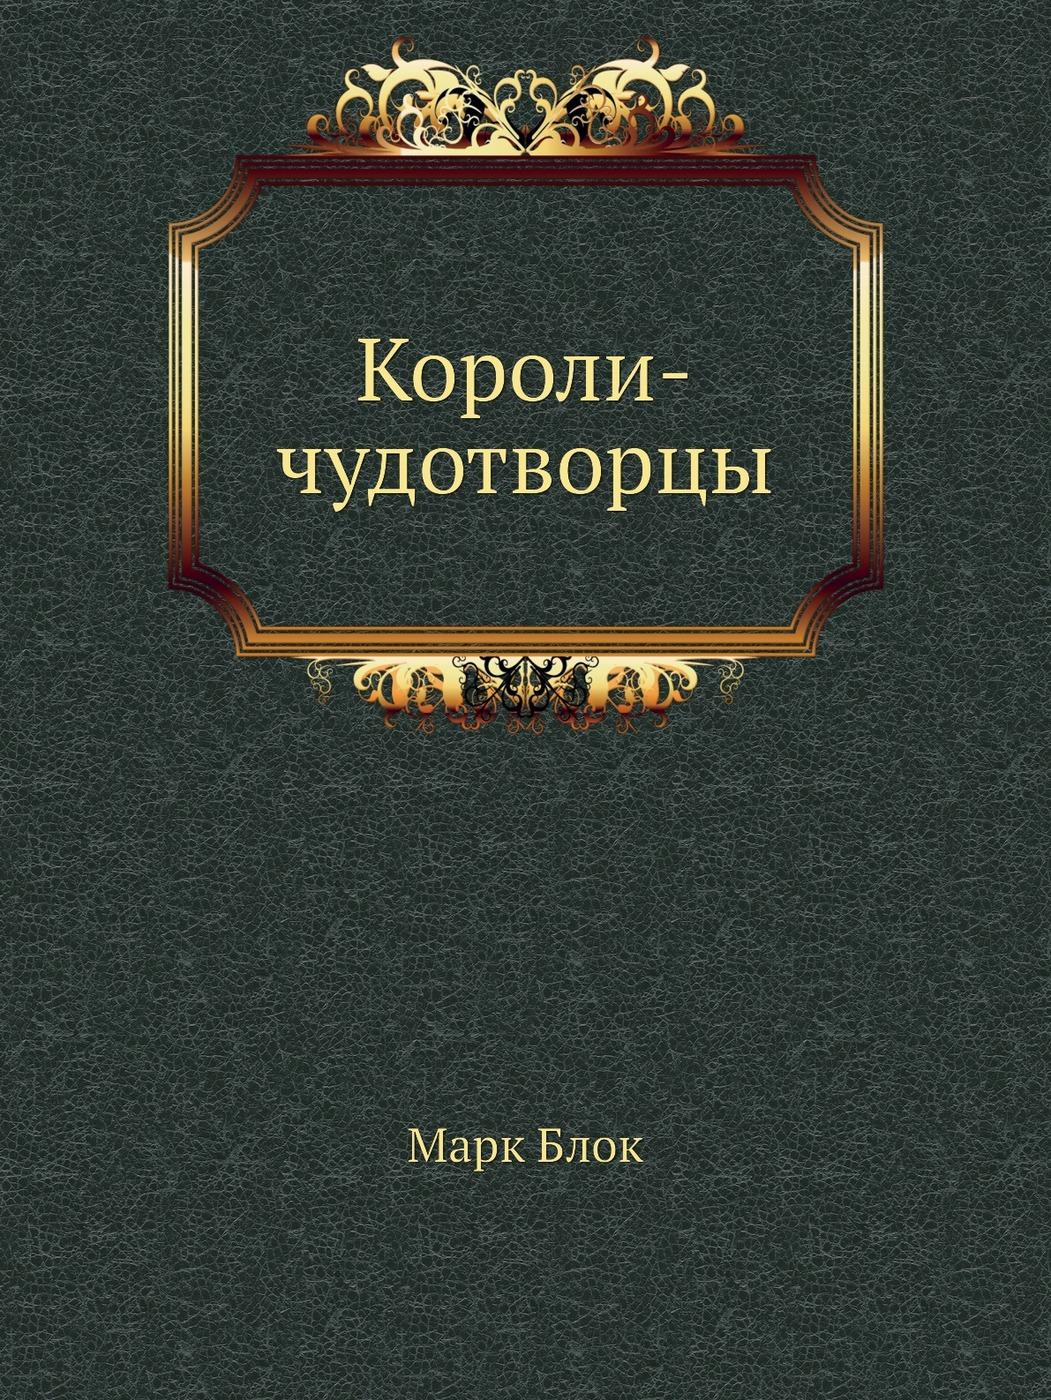 М. Блок Короли-чудотворцы